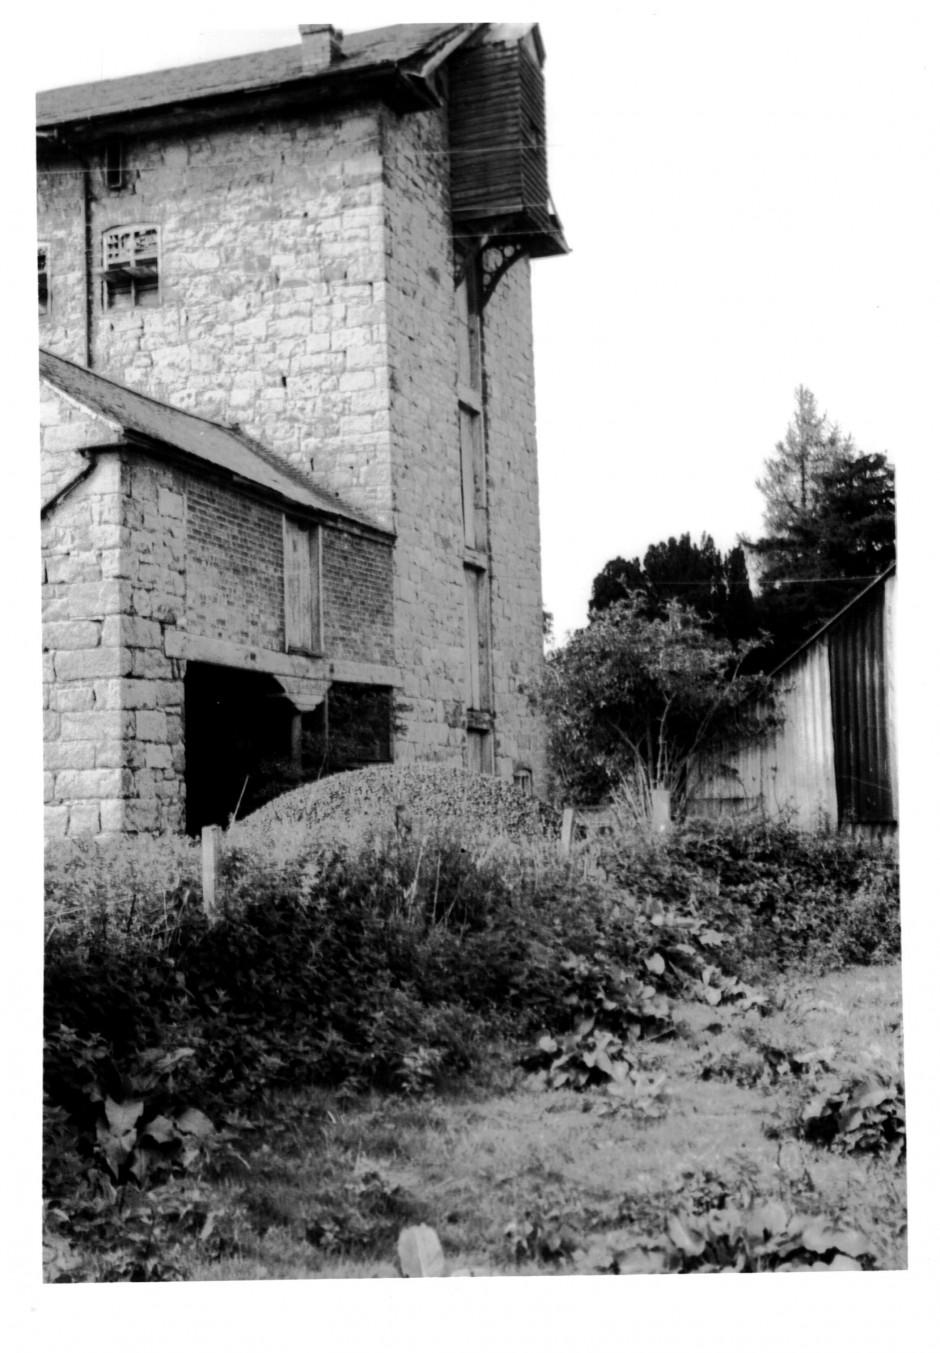 NM-O-5-10-85 - Morda Mill